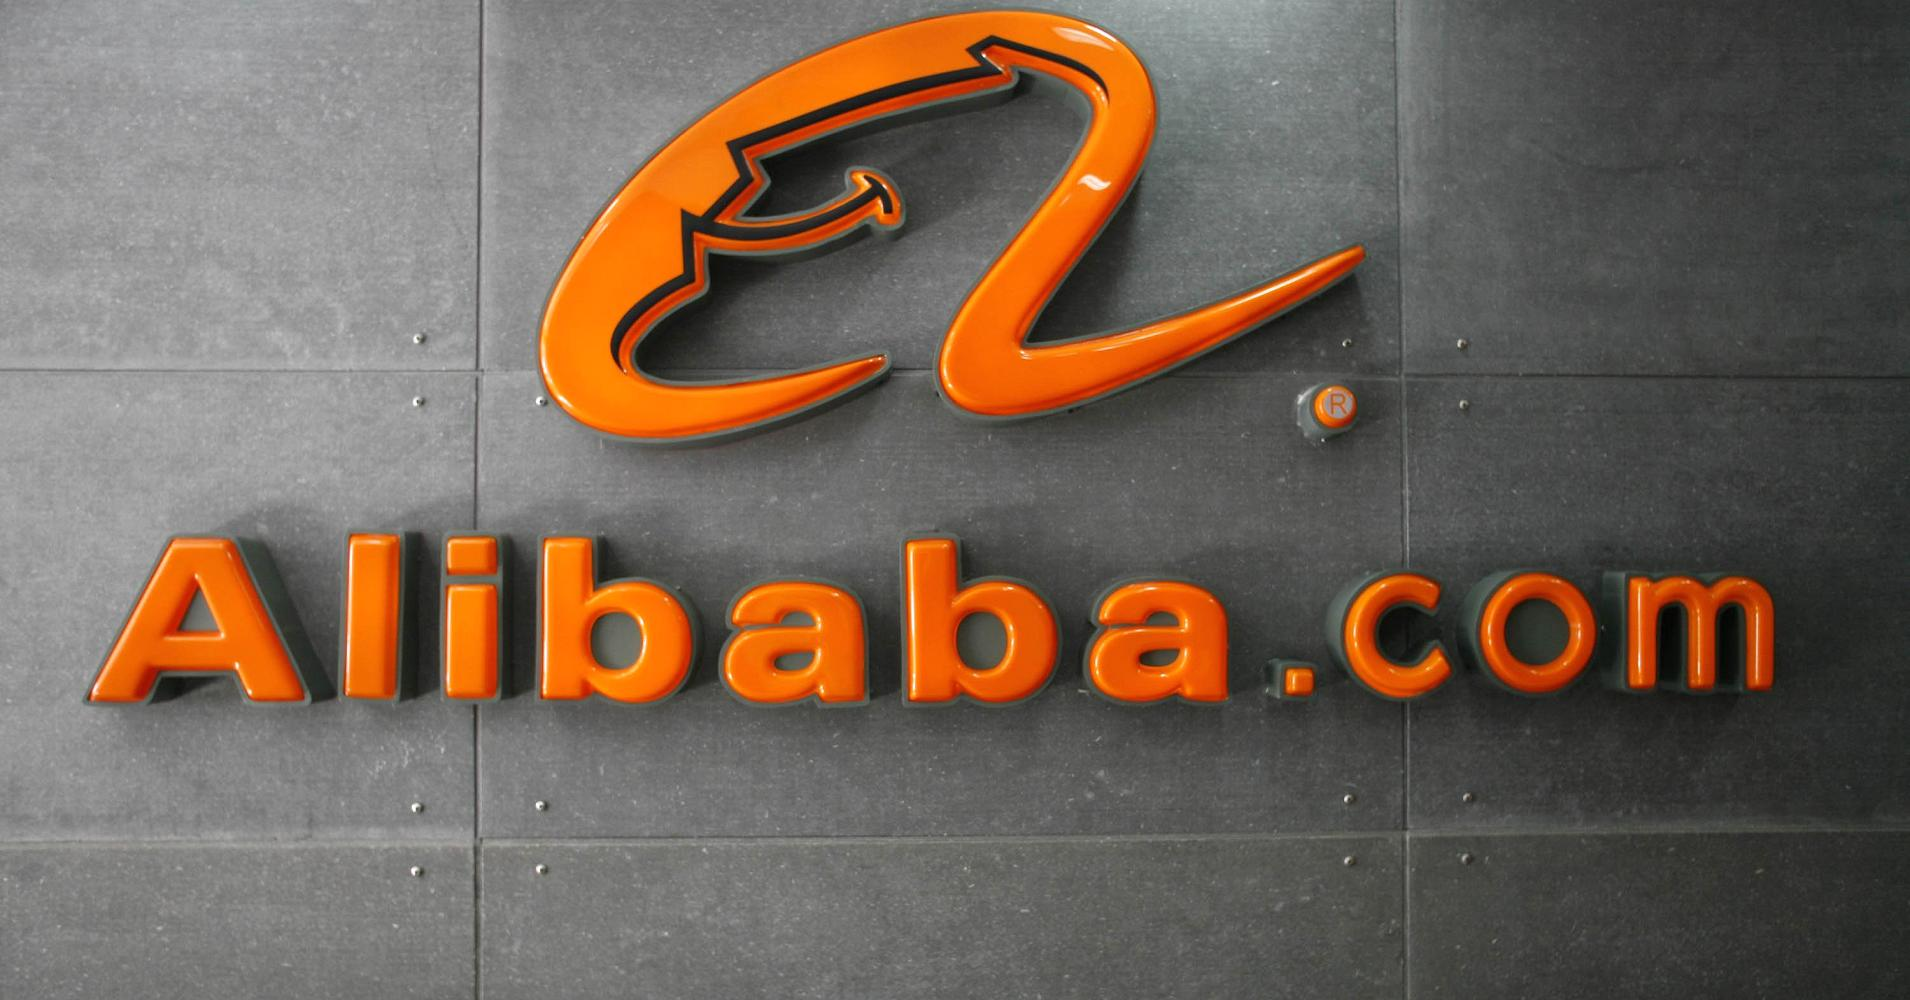 alibaba shares